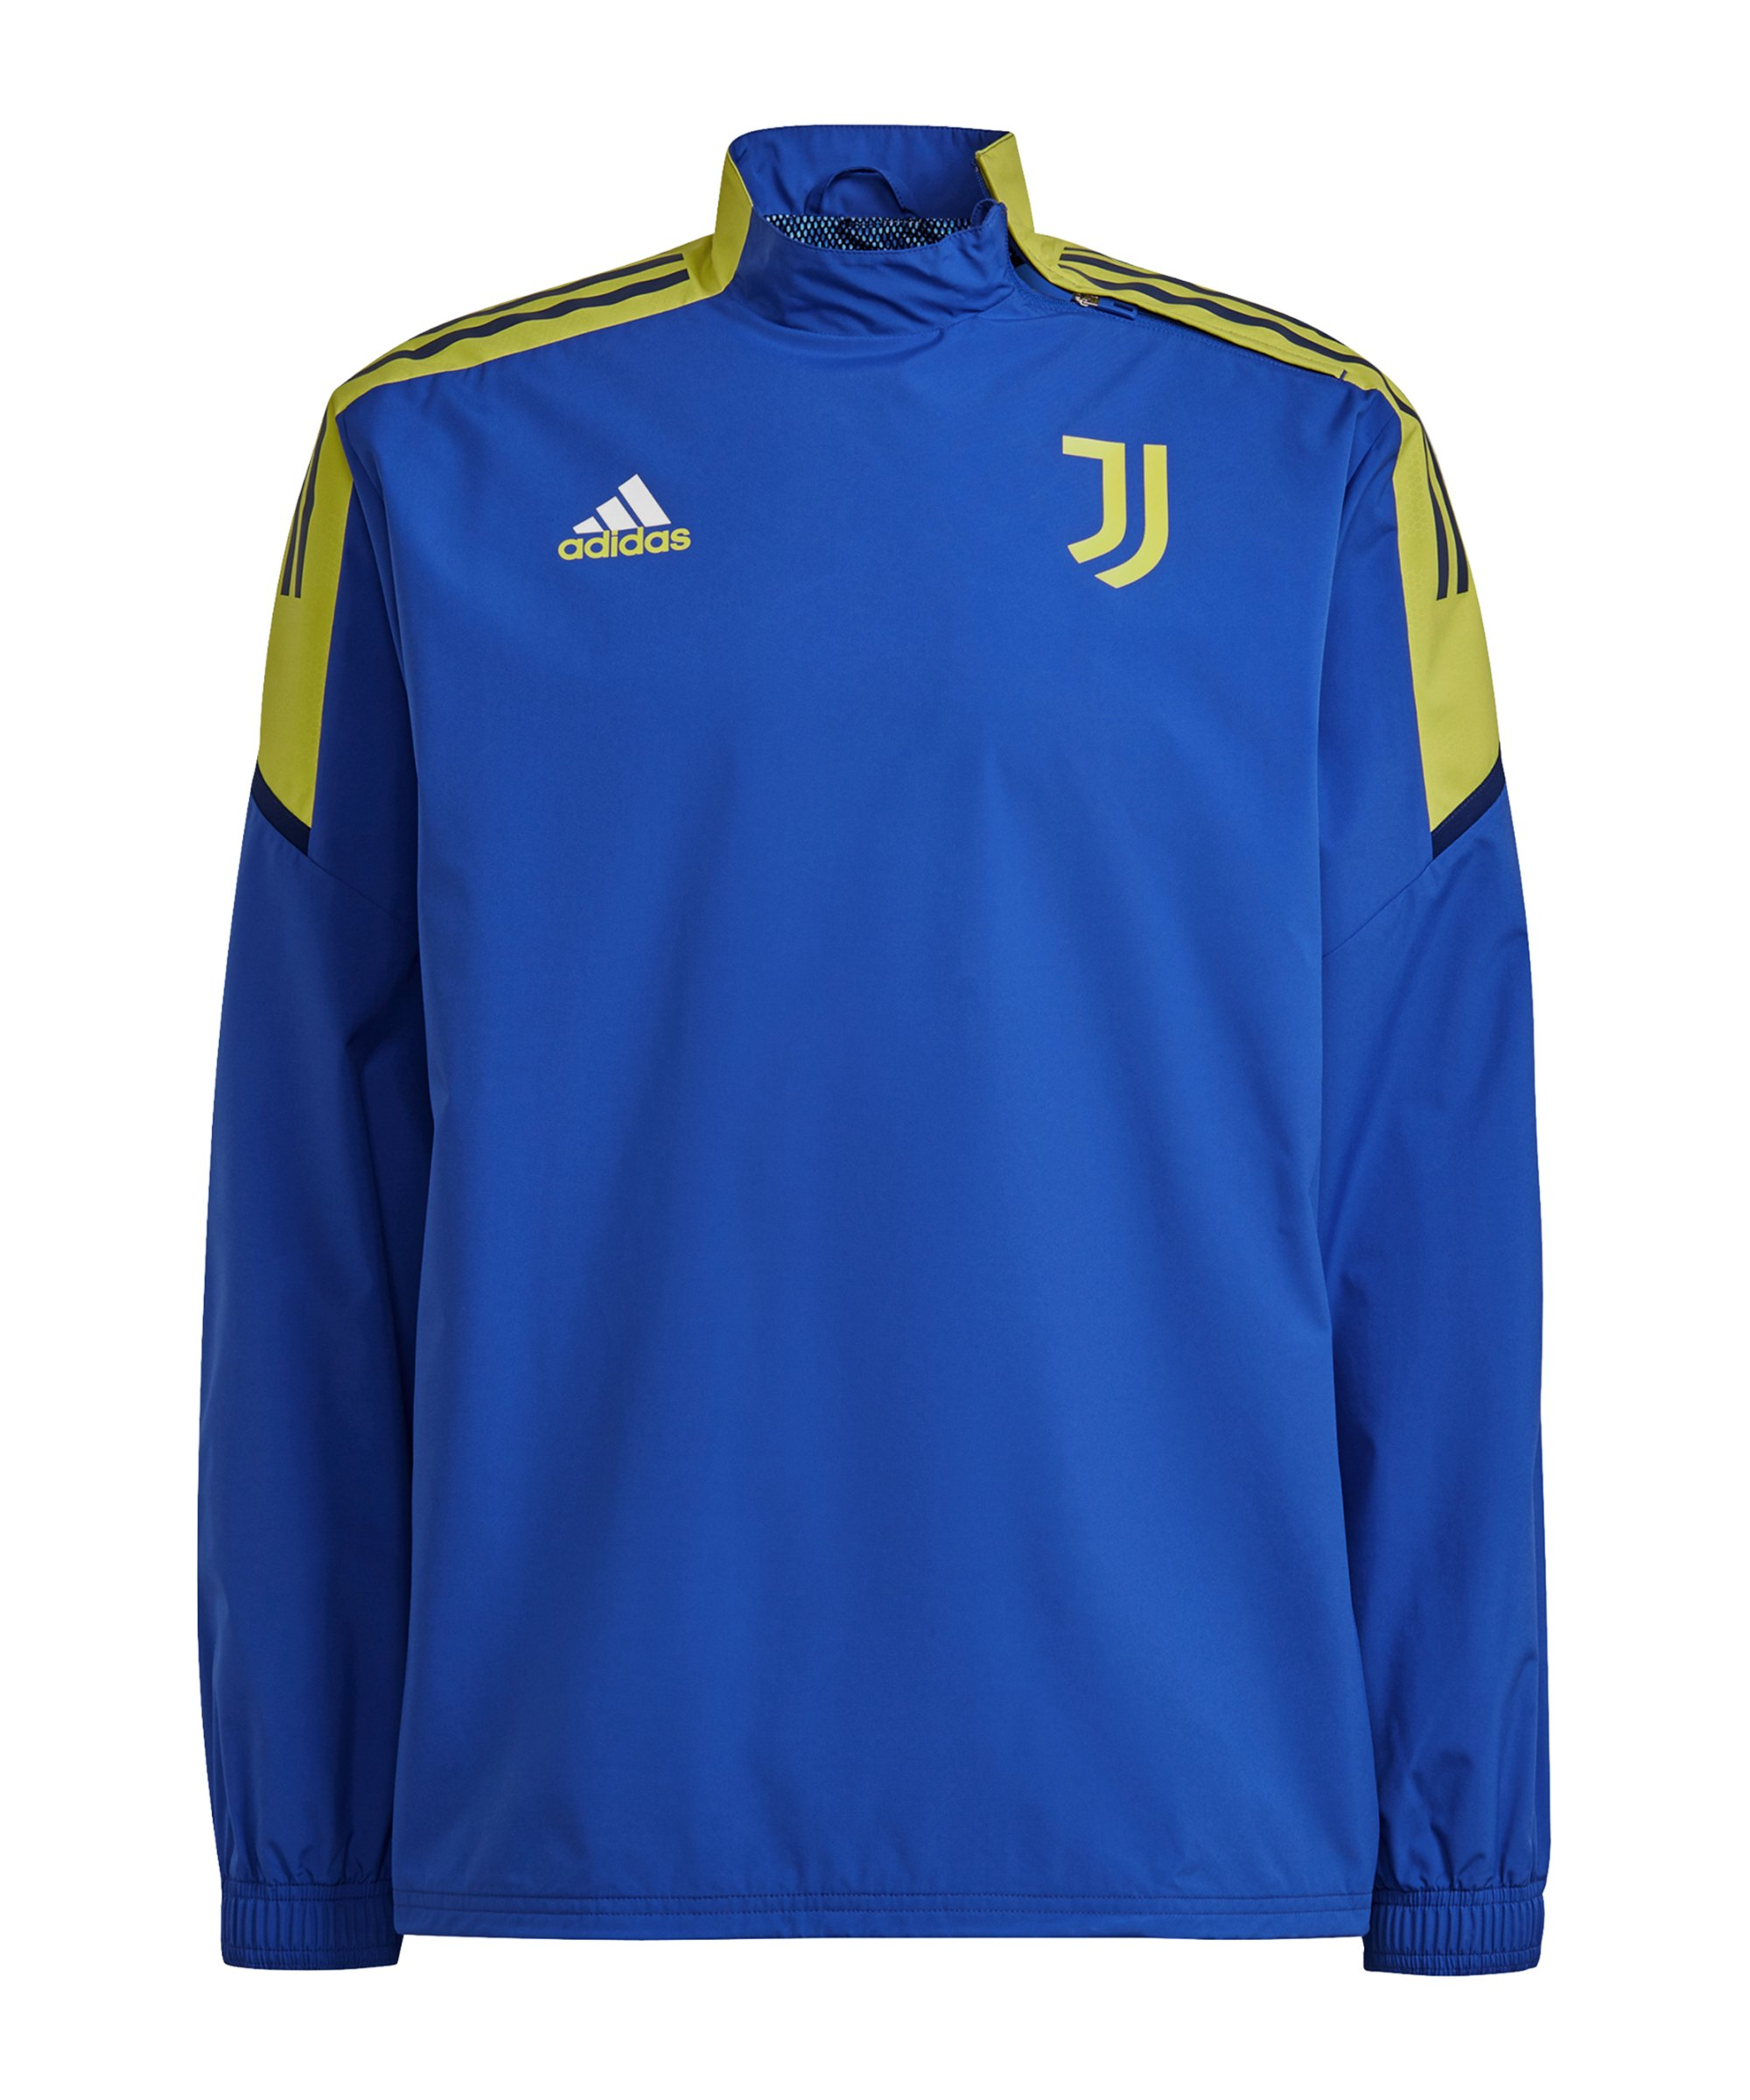 adidas Juventus Turin Sweatshirt Blau Gelb - gelb